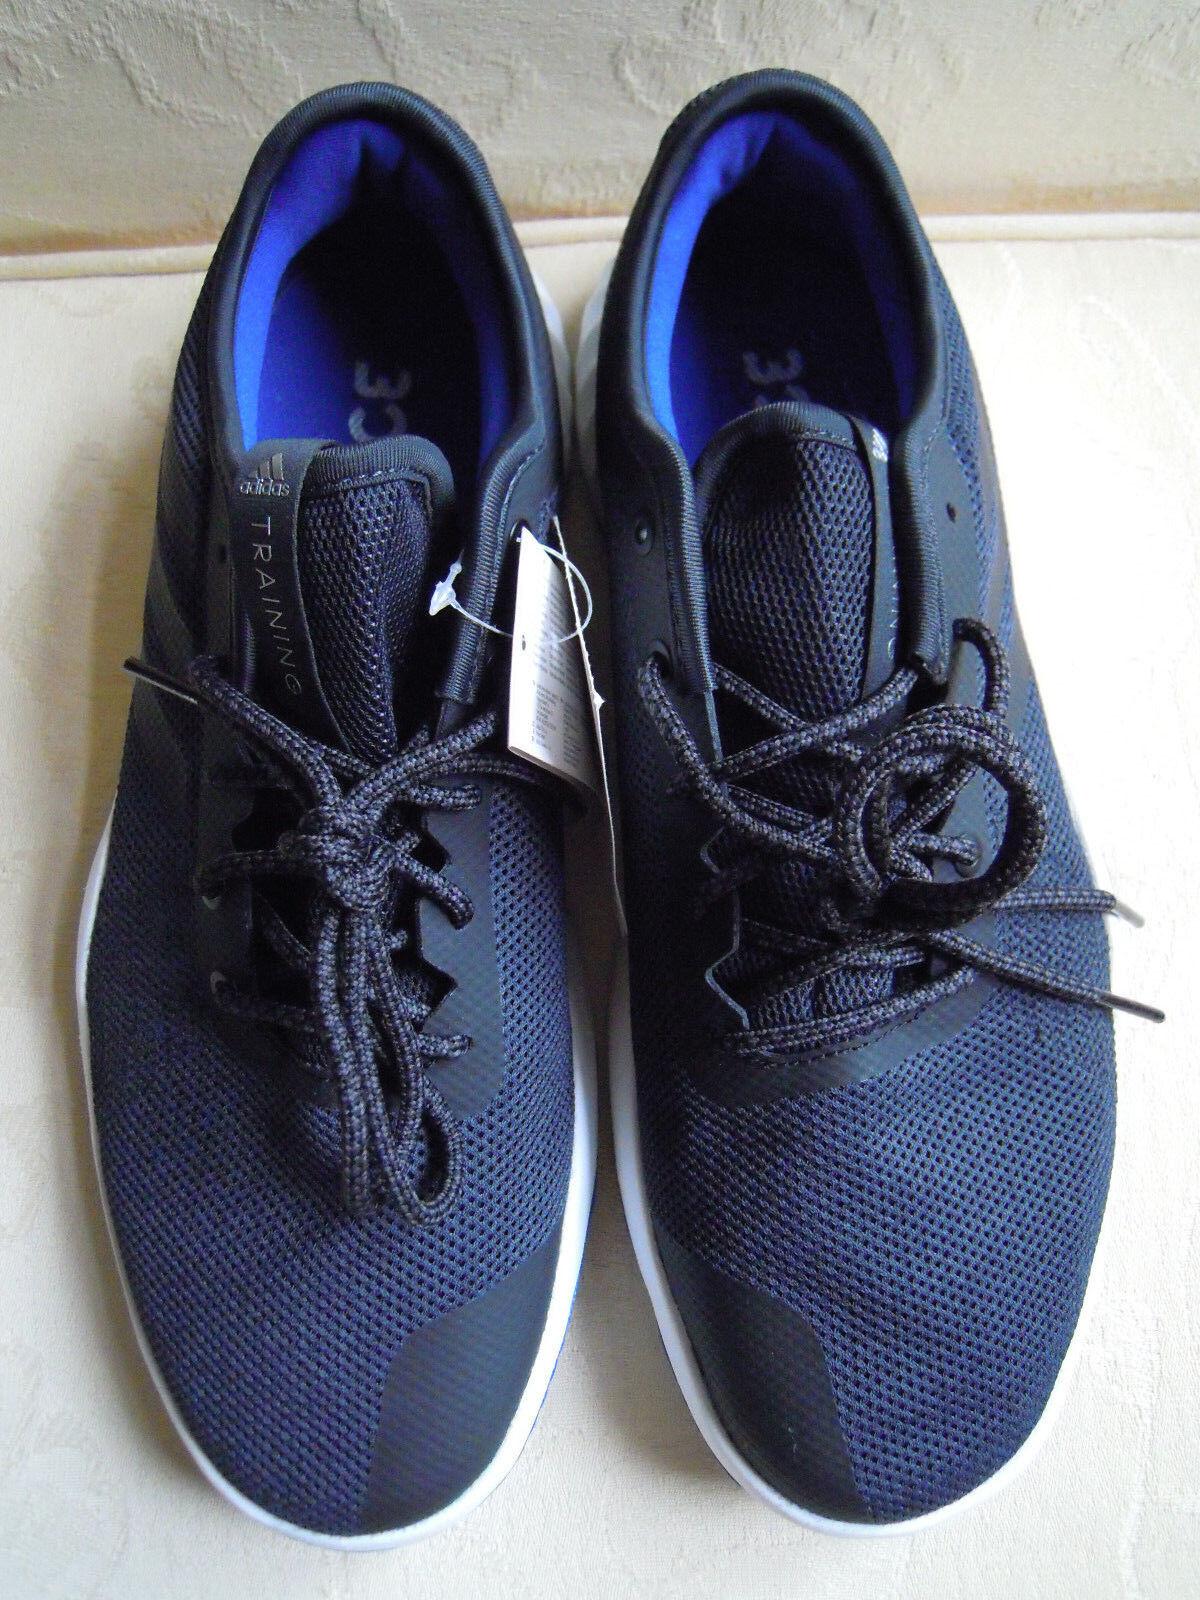 Adidas Training   Sport, Lauf, Jogging, Schuhe Gr  45 1 3 - Schwarz   NEU IN OVP